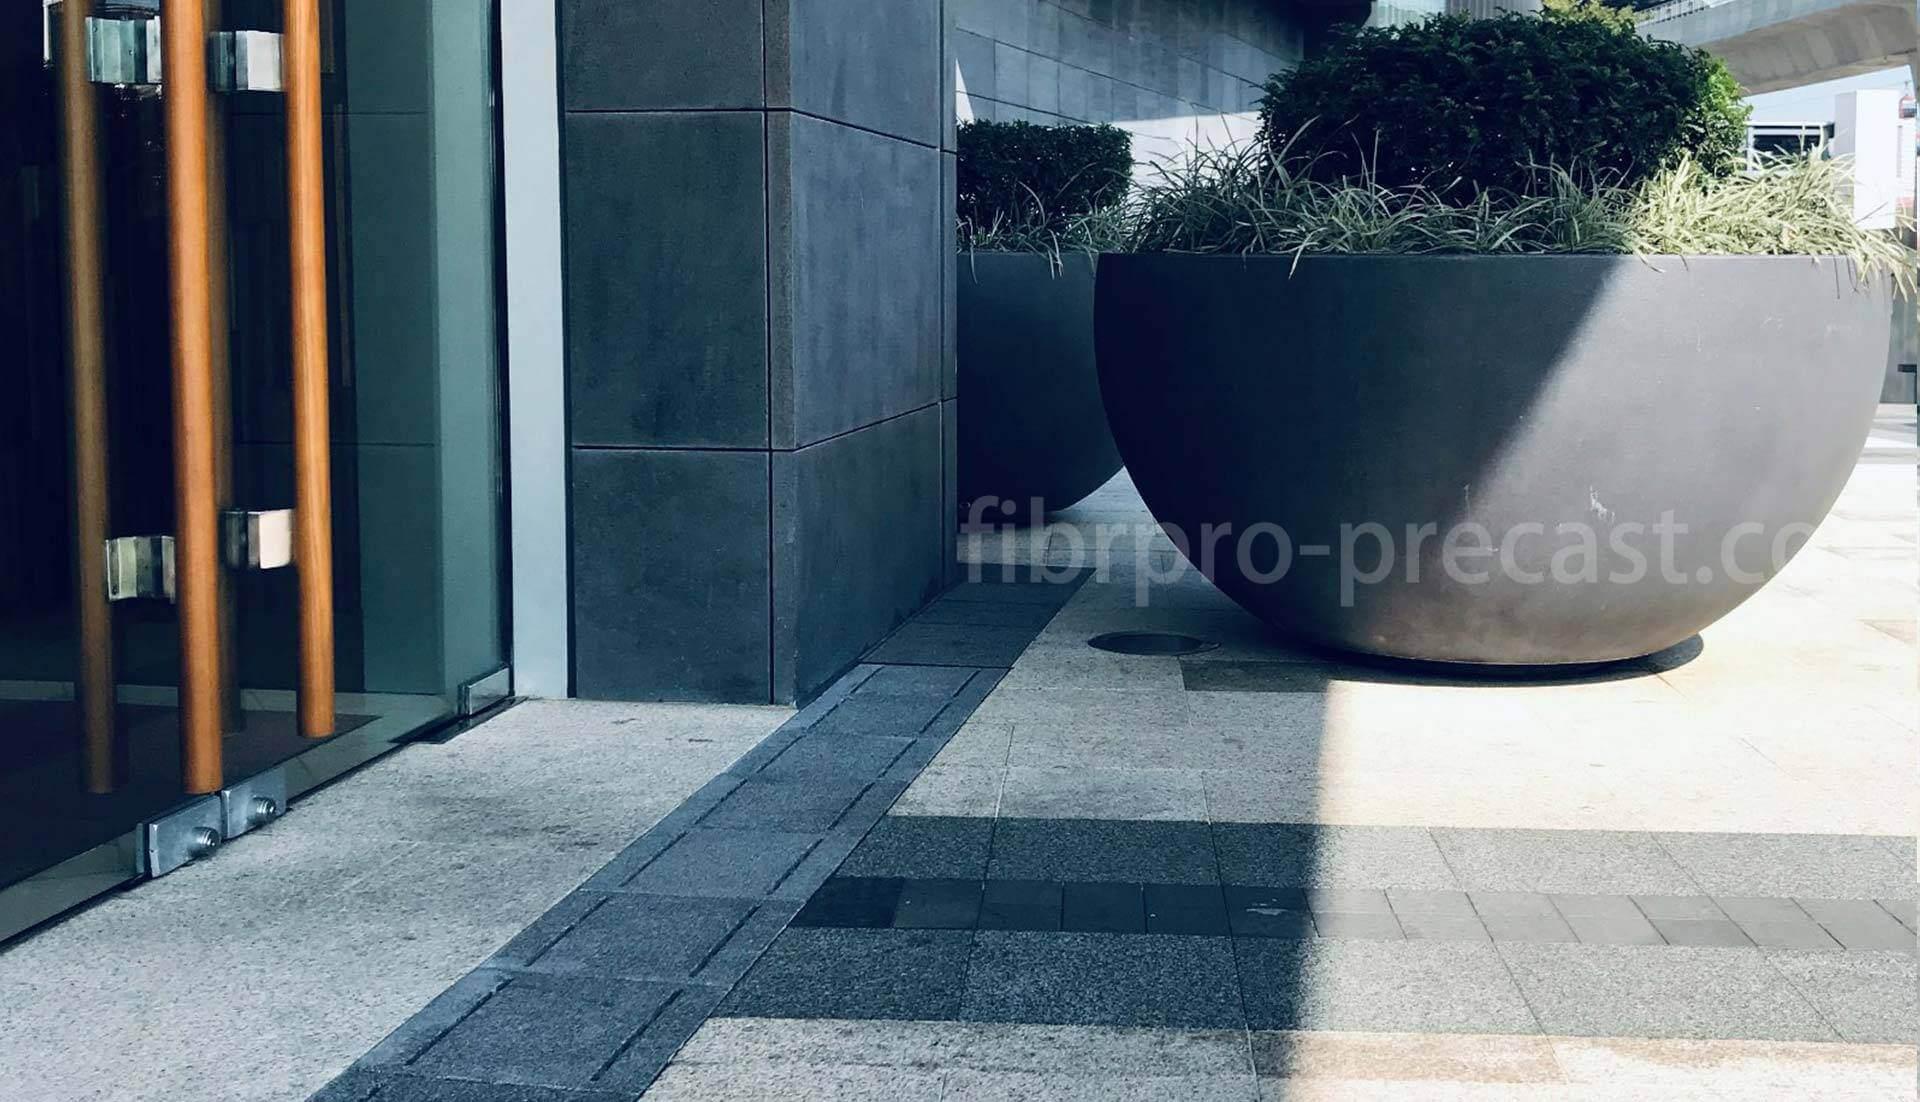 fibrpro-precast_reinforced_stone_grates_02_1920x1102_p01_v01